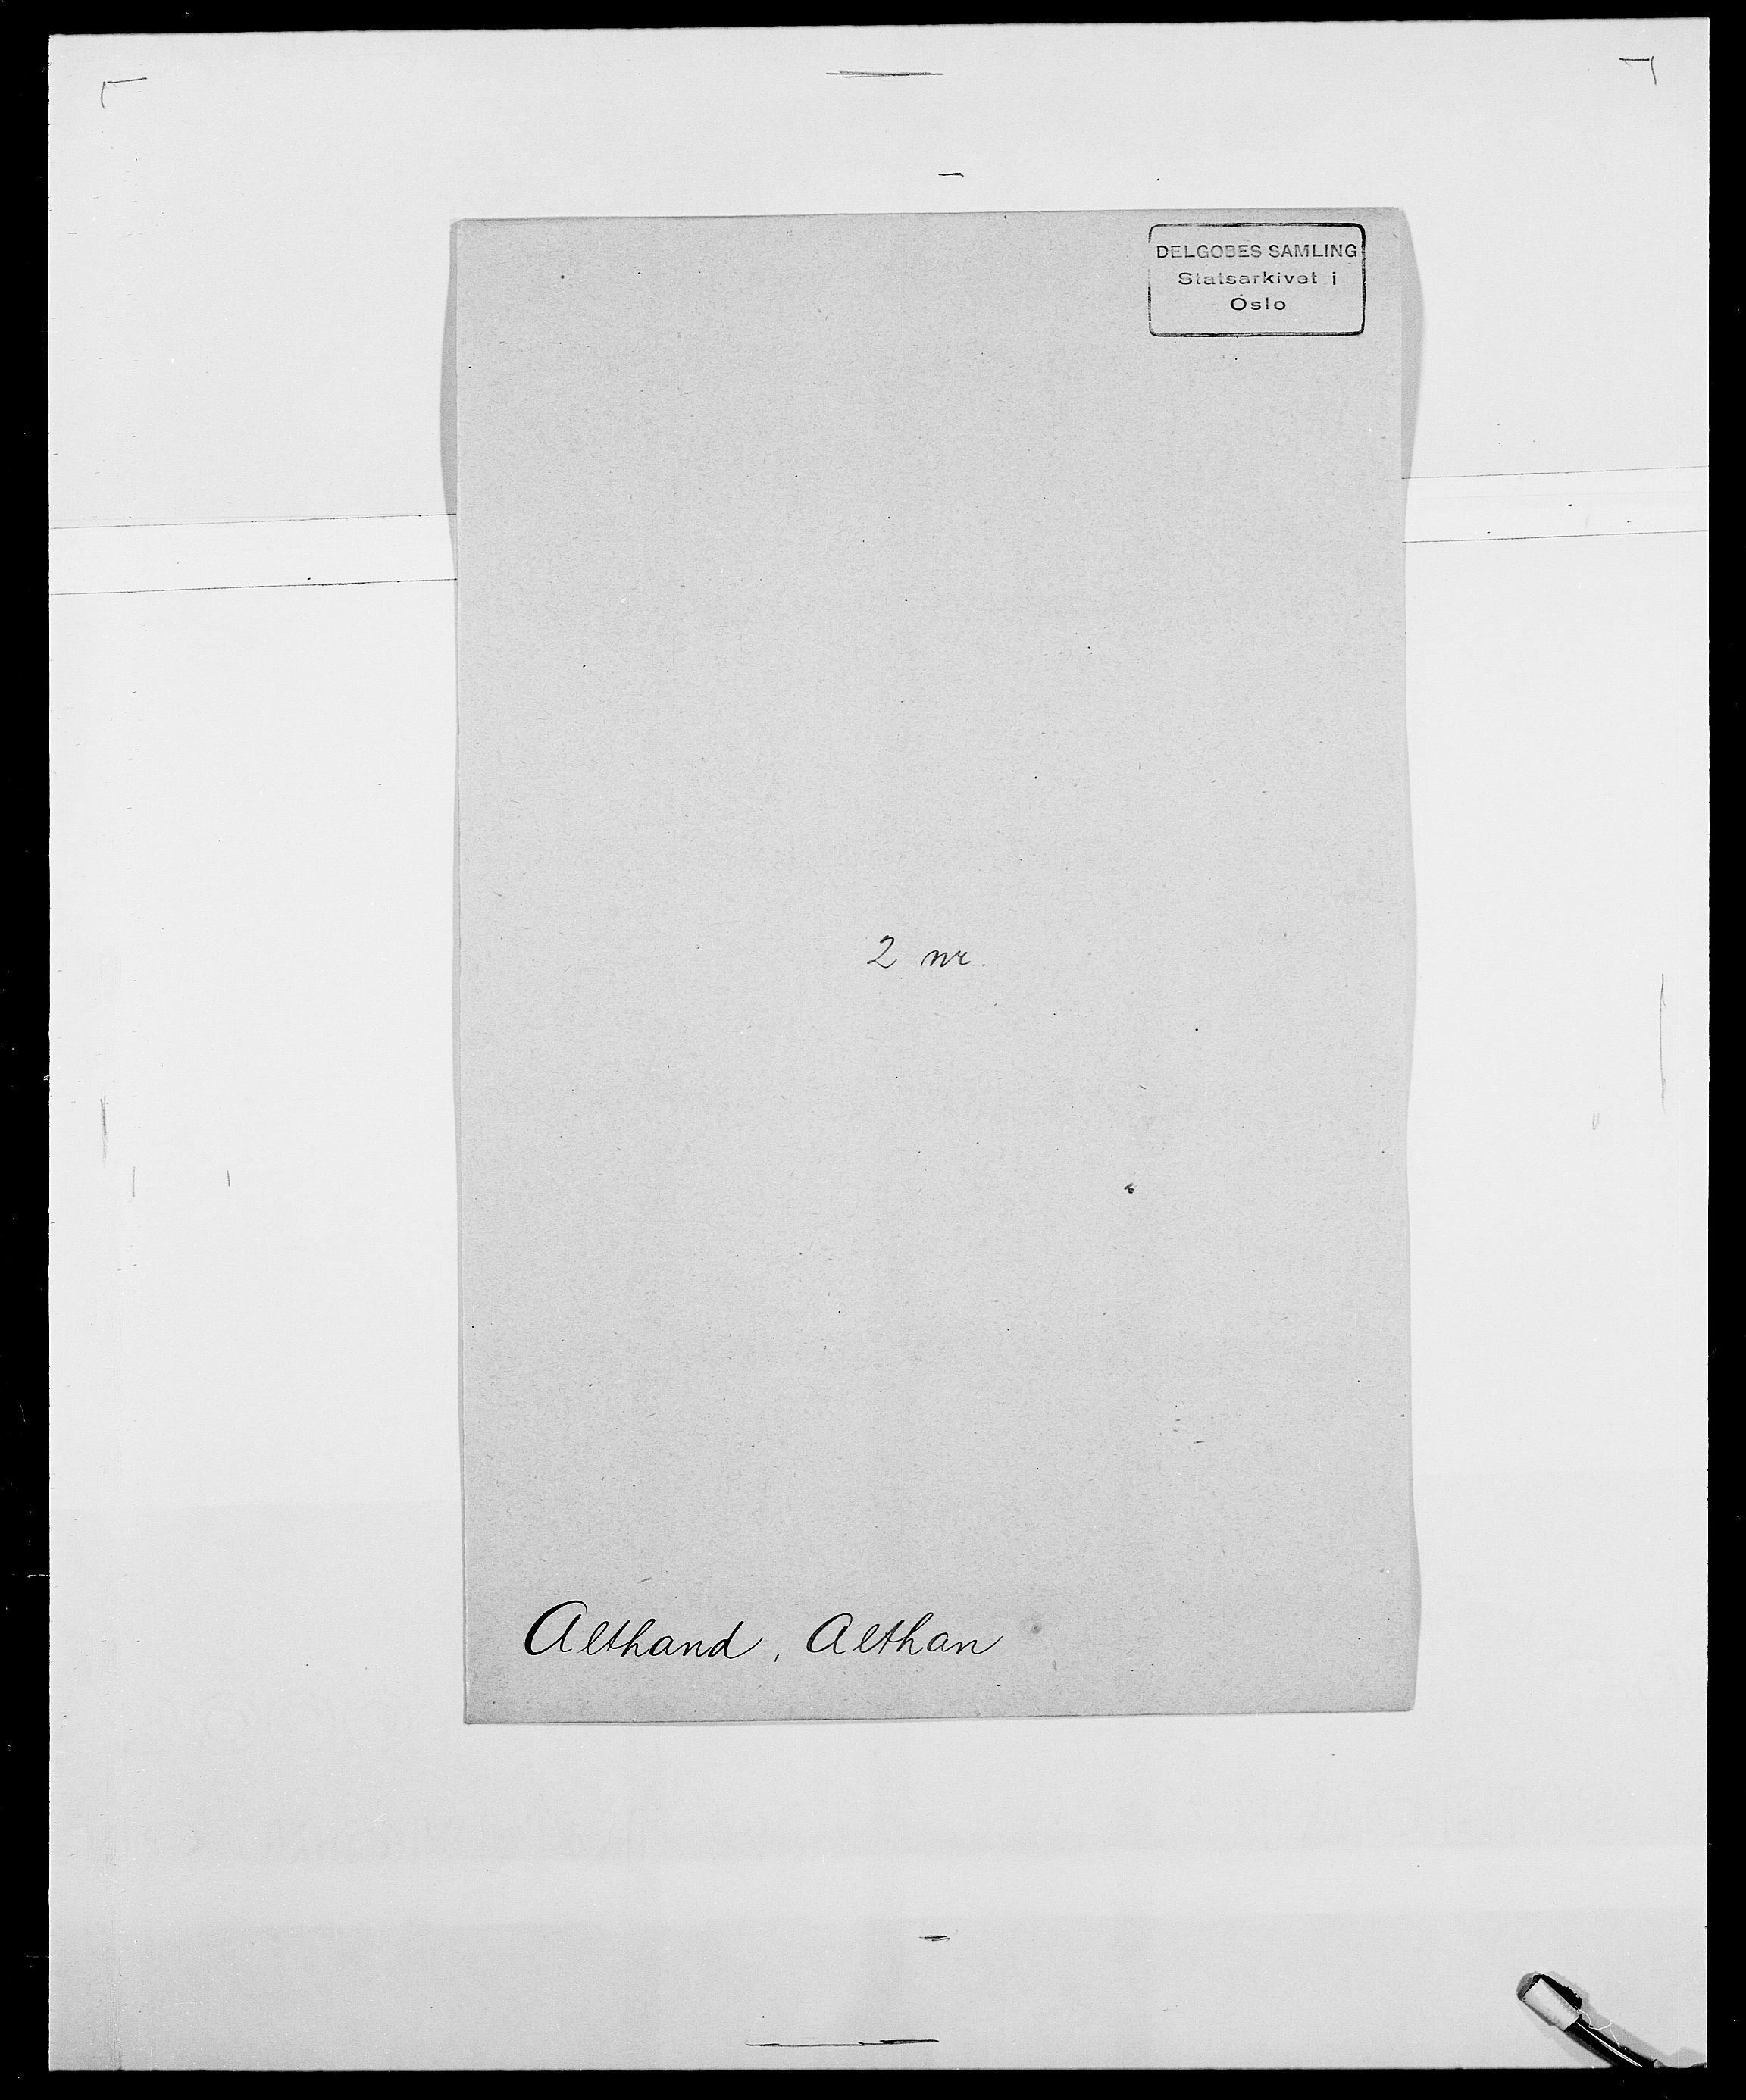 SAO, Delgobe, Charles Antoine - samling, D/Da/L0001: Aabye - Angerman, s. 496